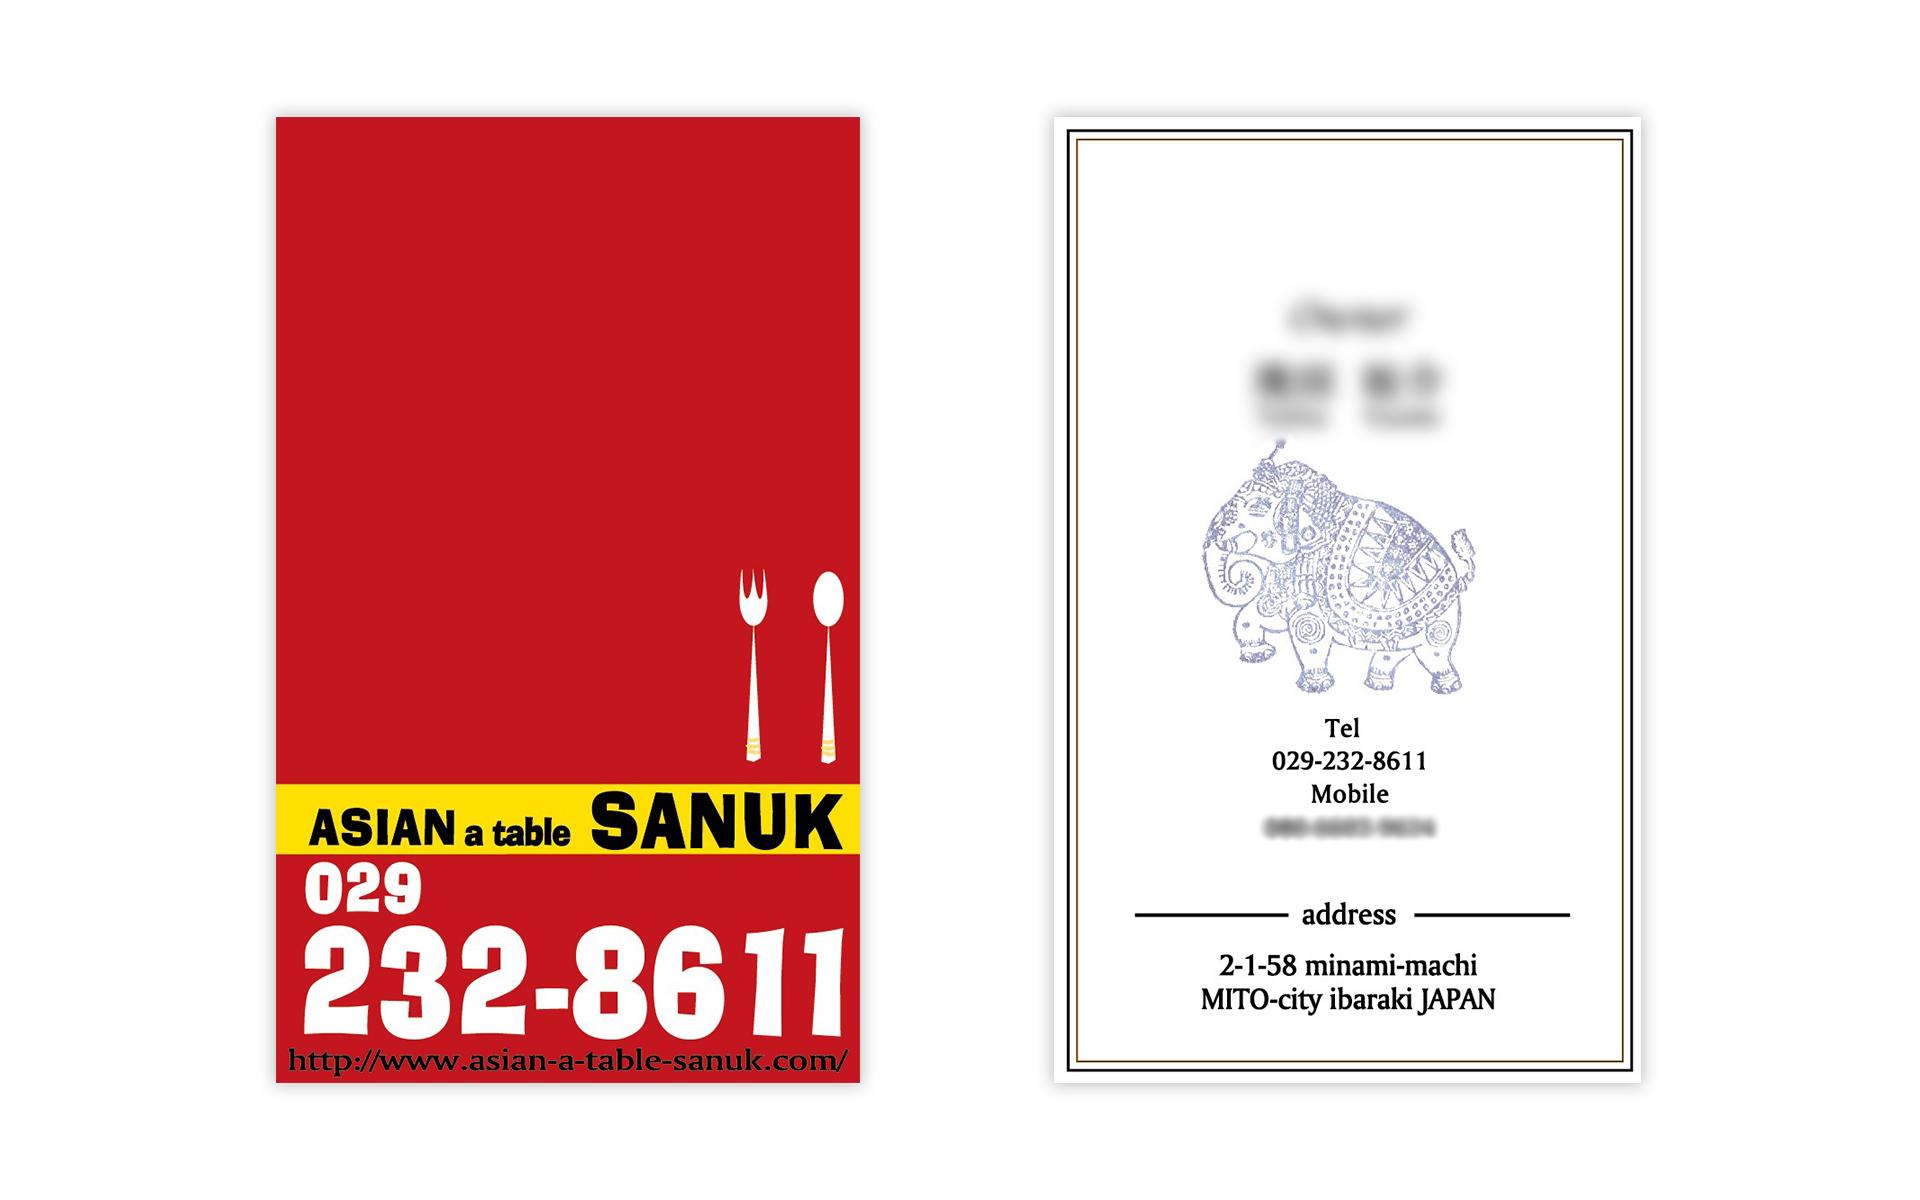 ASIAN a table SANUK 名刺